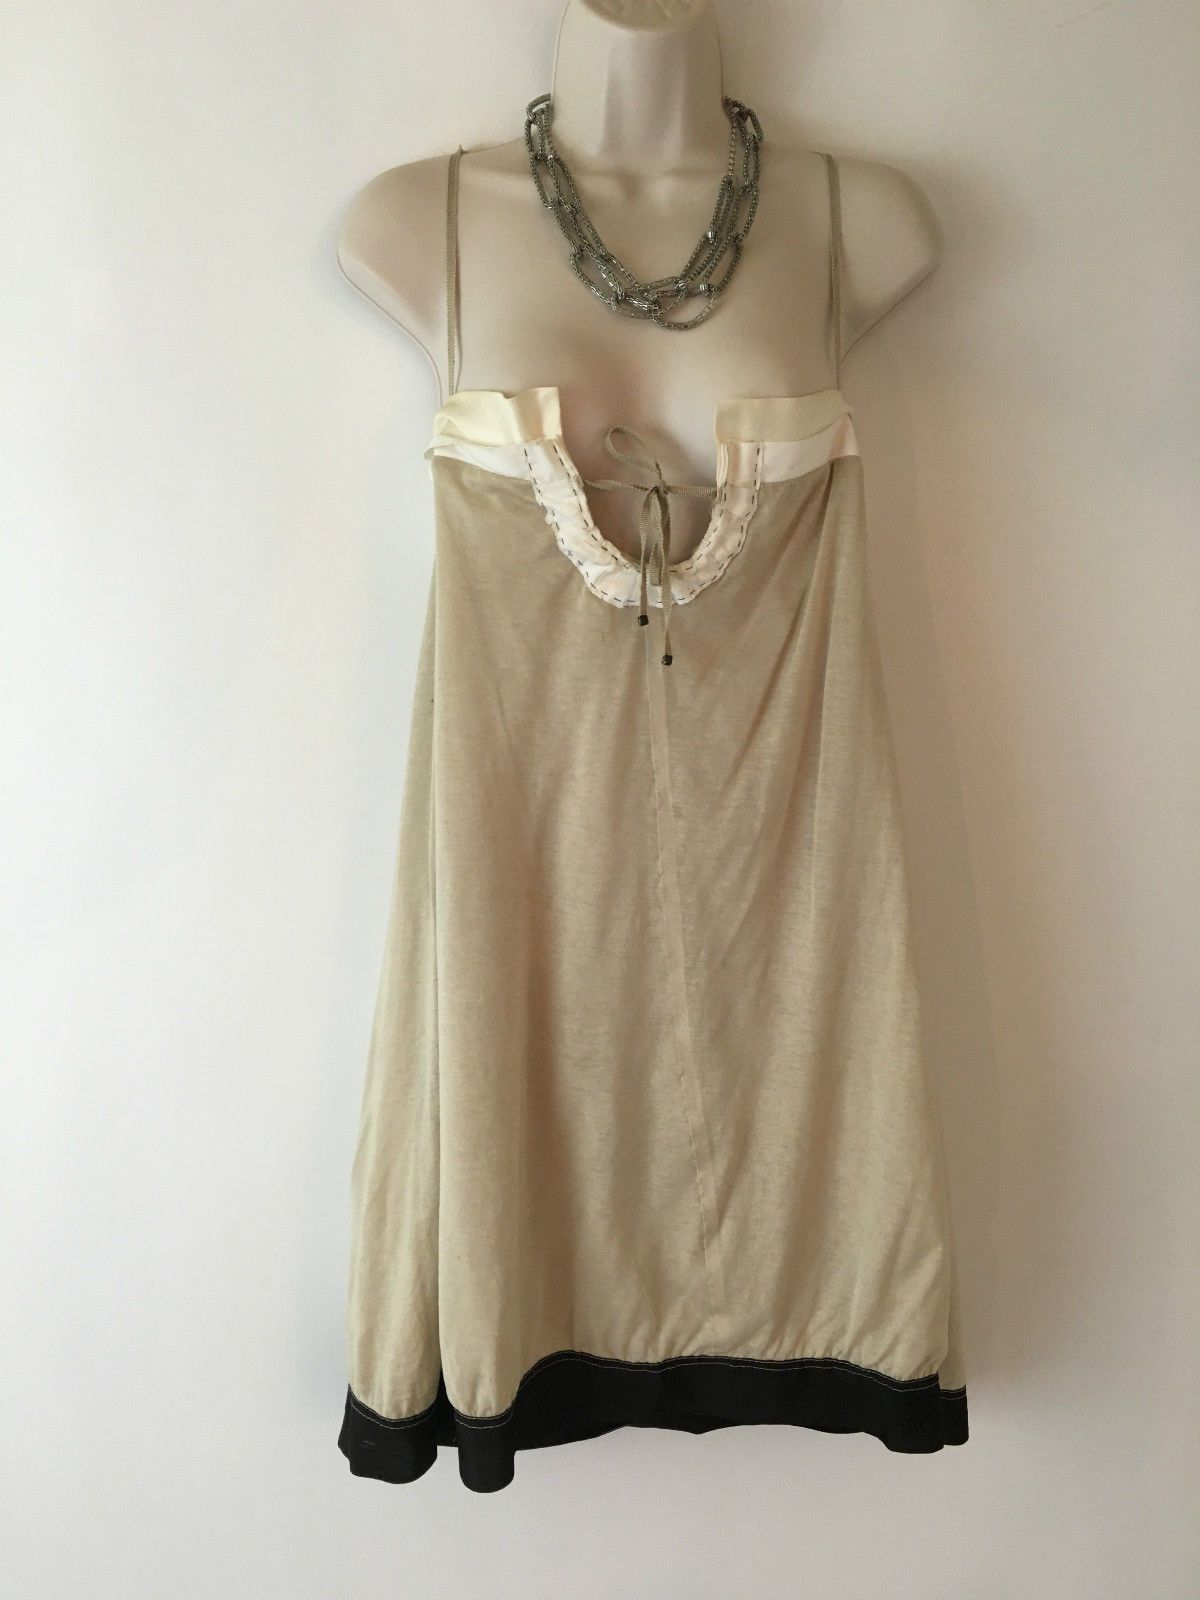 Philosophy Di Alberta FERRETTI Made Italy Beige Shift Casual Boho Summer Dress S | eBay